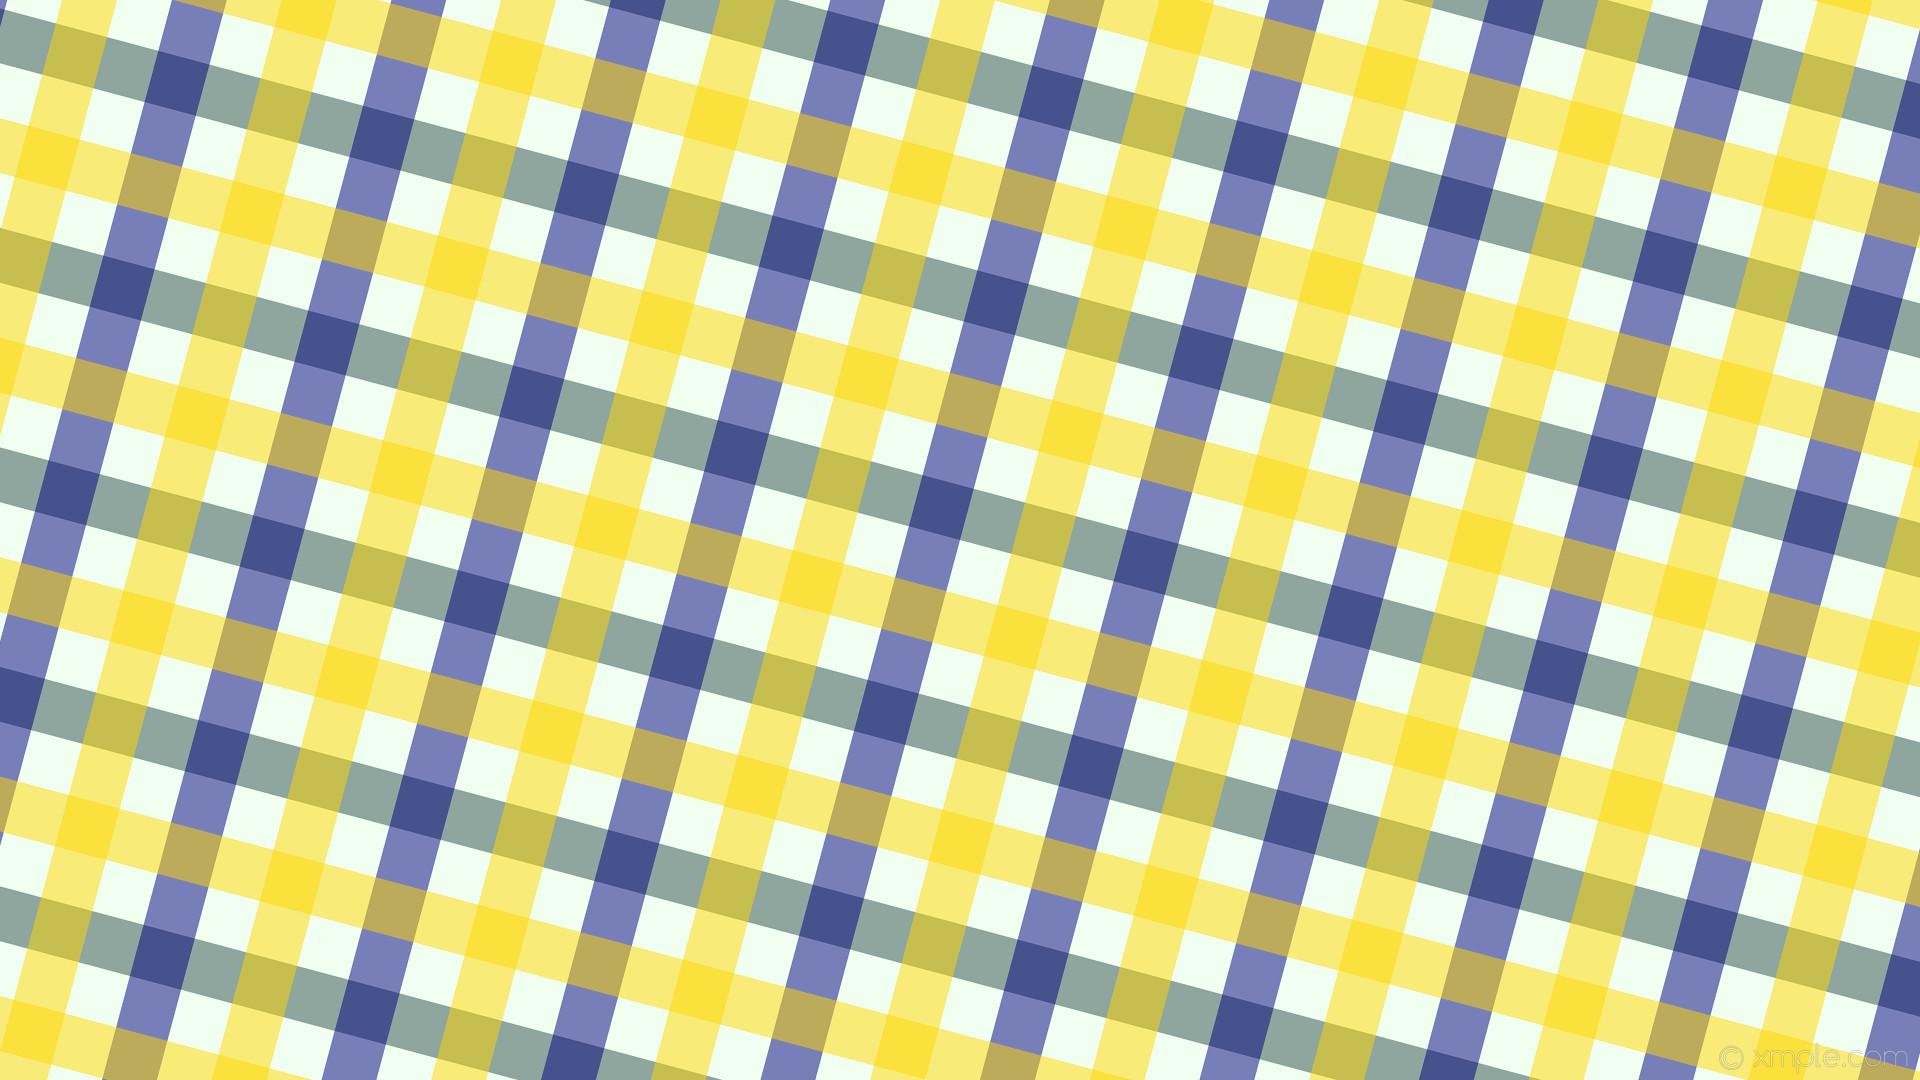 wallpaper quad striped white gingham blue yellow grey honeydew dark slate  gray navy gold #f0fff0